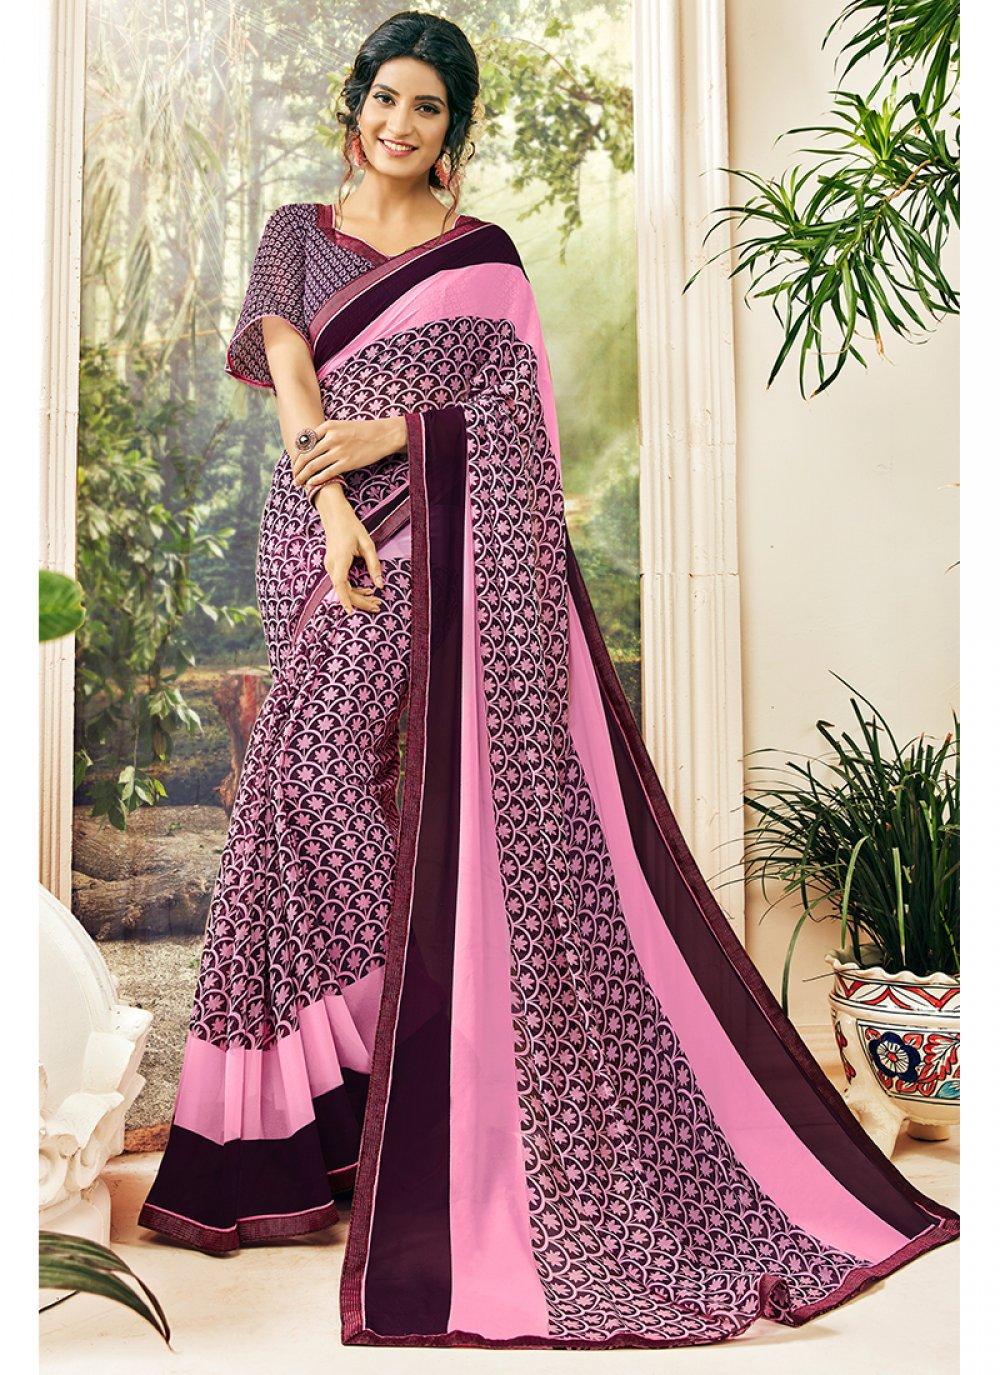 Georgette Pink and Purple Printed Saree